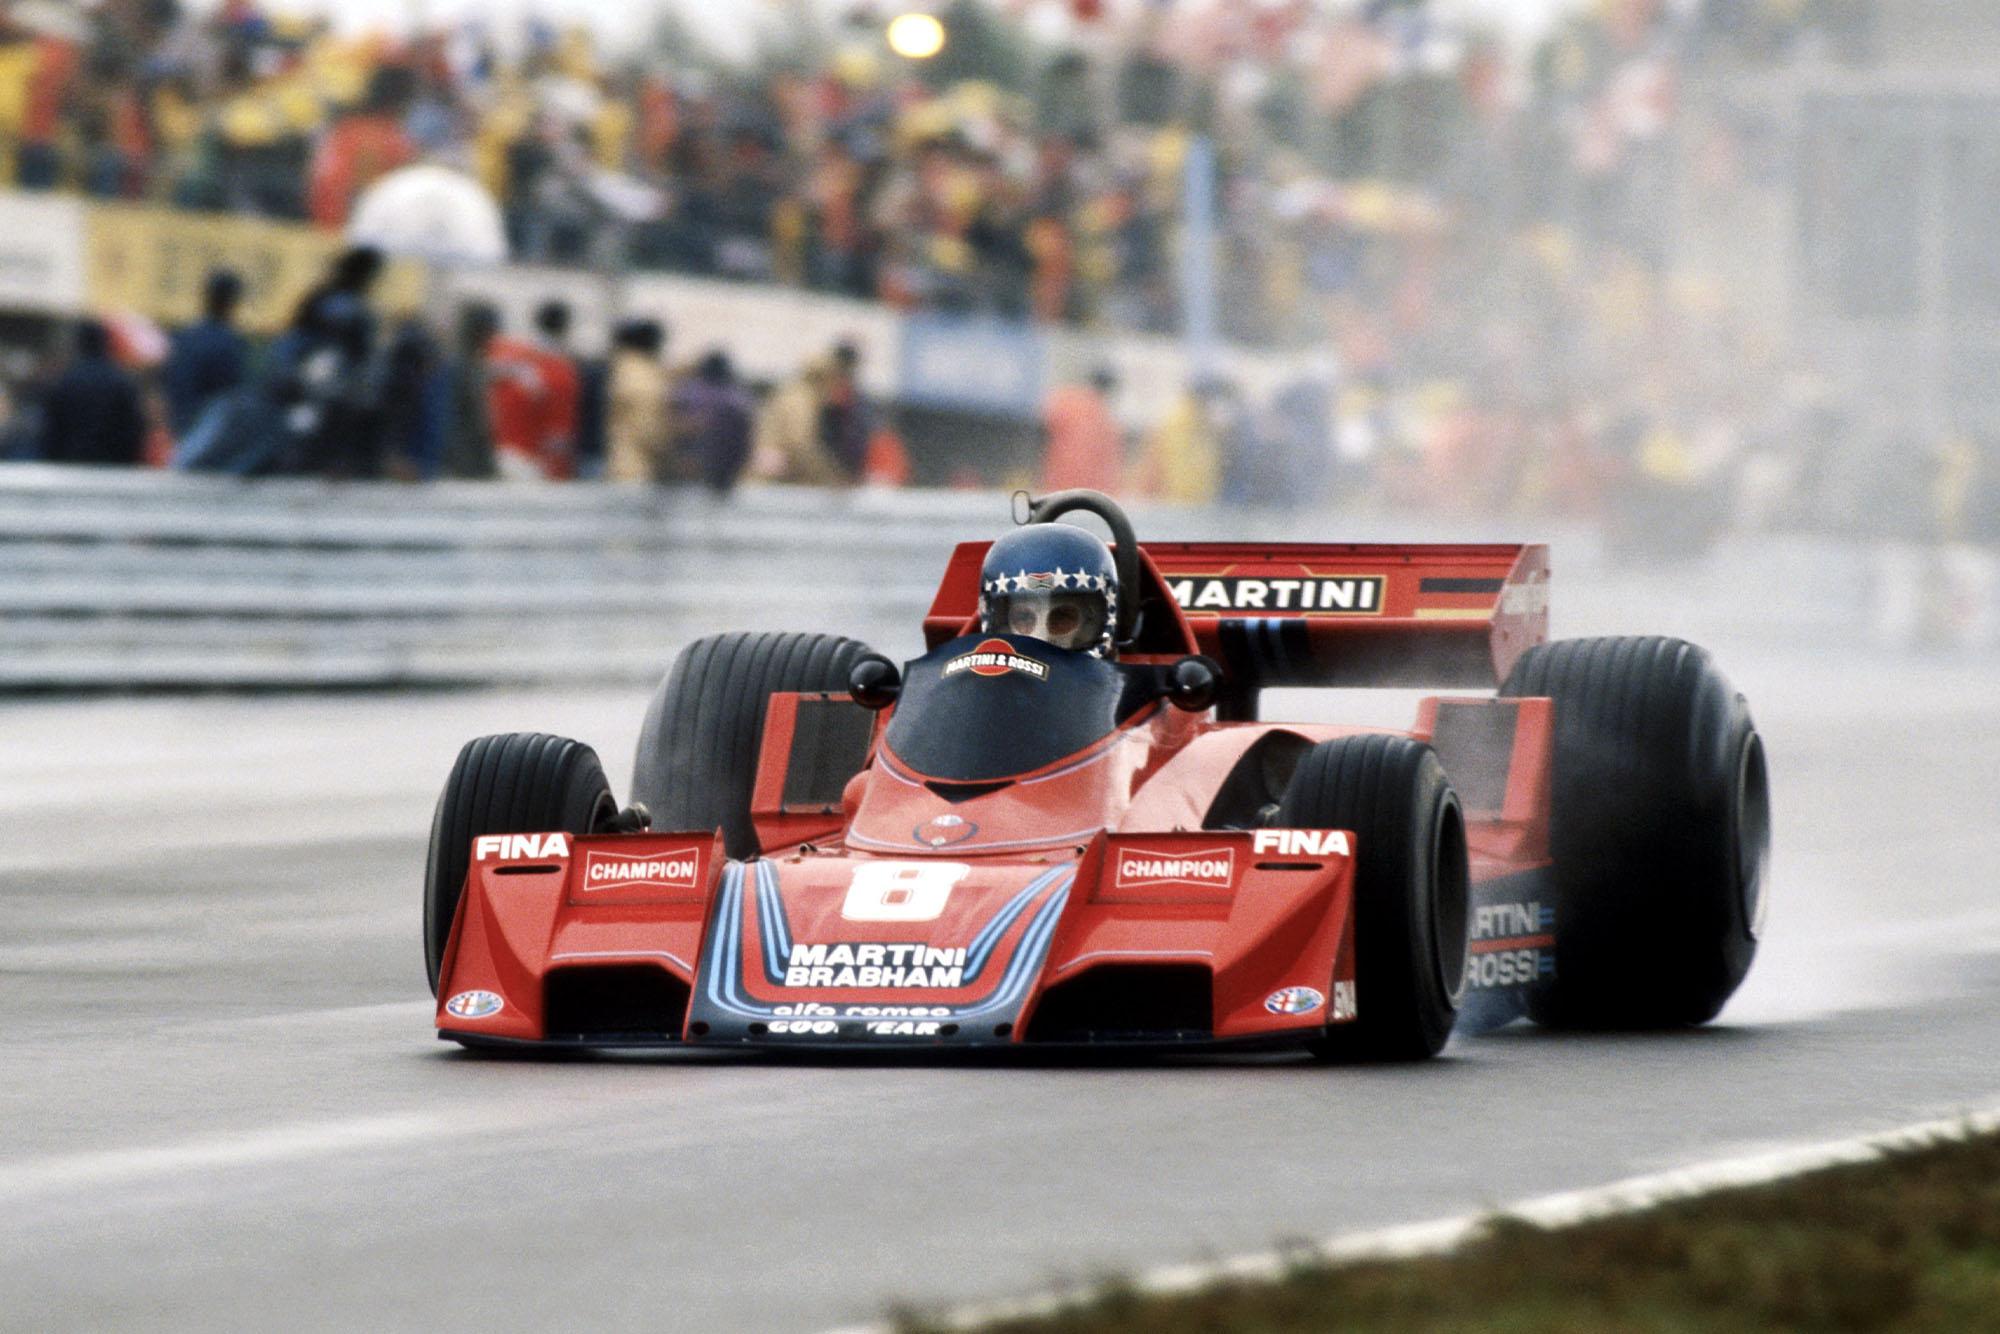 Hans-Joachim Stuck driving for Brabham at the 1977 United States Grand Prix East, Watkins Glen